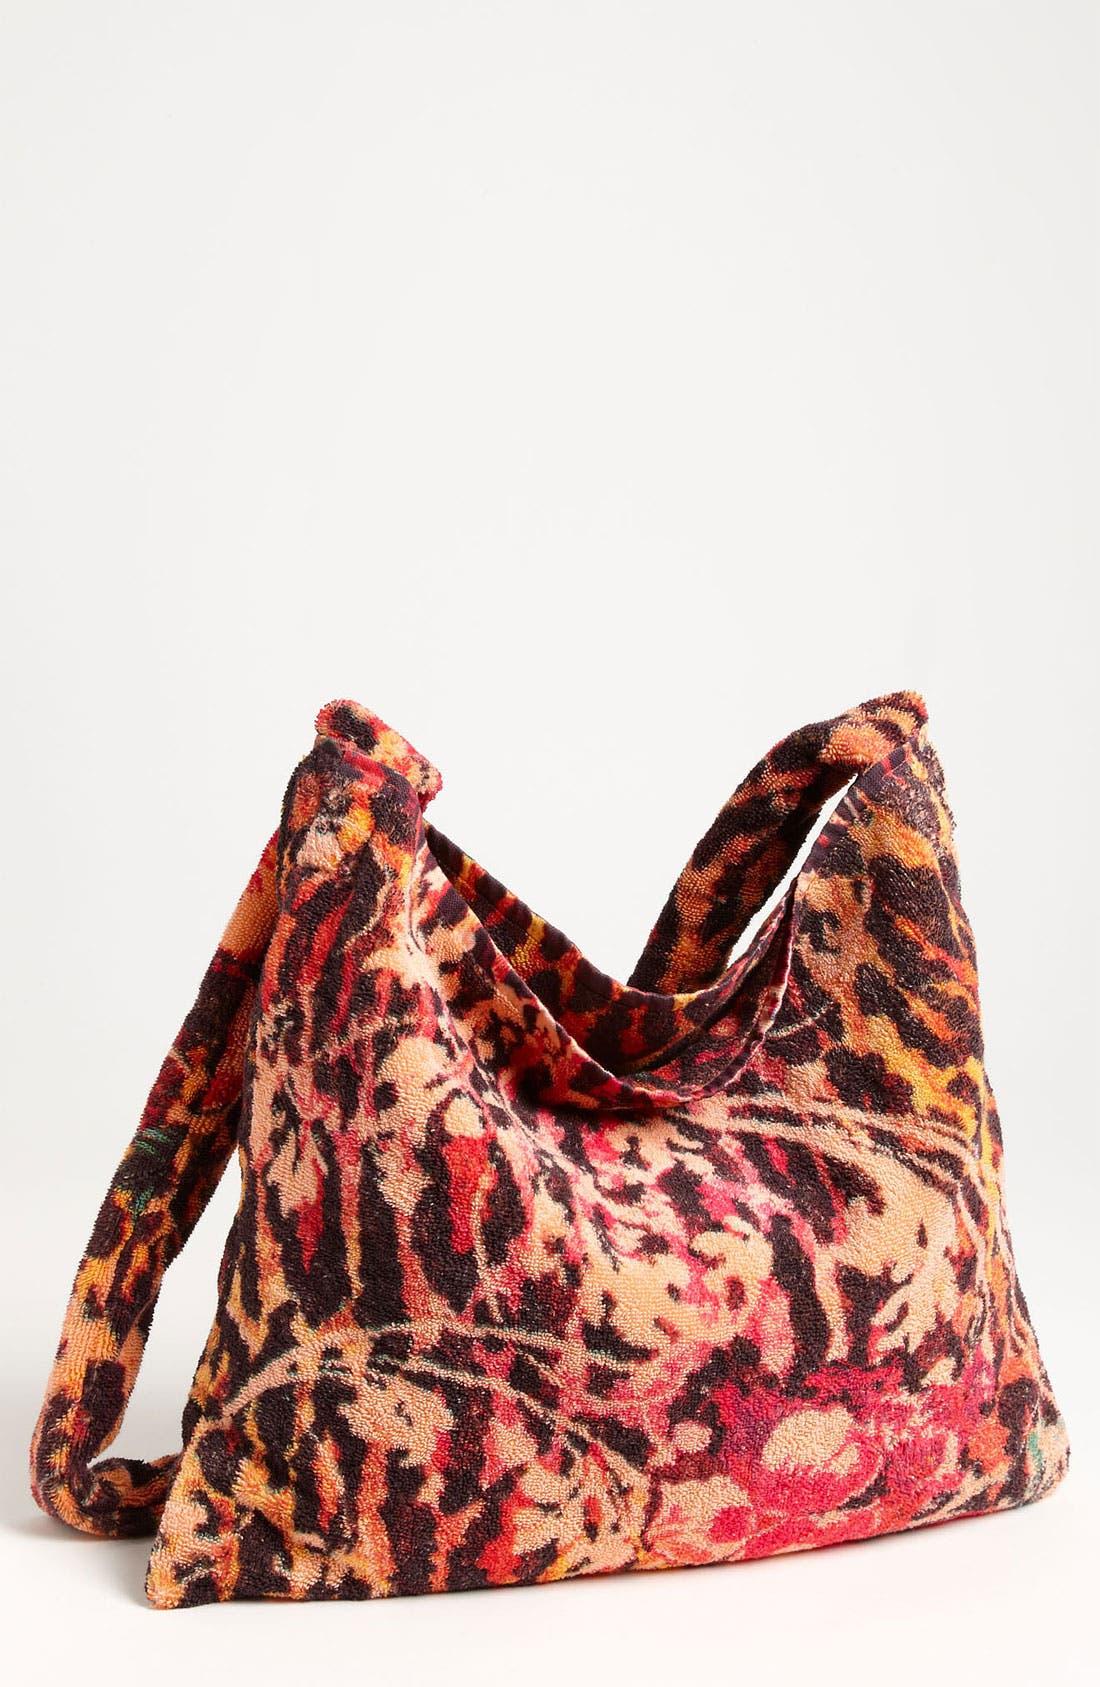 Main Image - Fresco Towels 'Small' Terry Messenger Bag